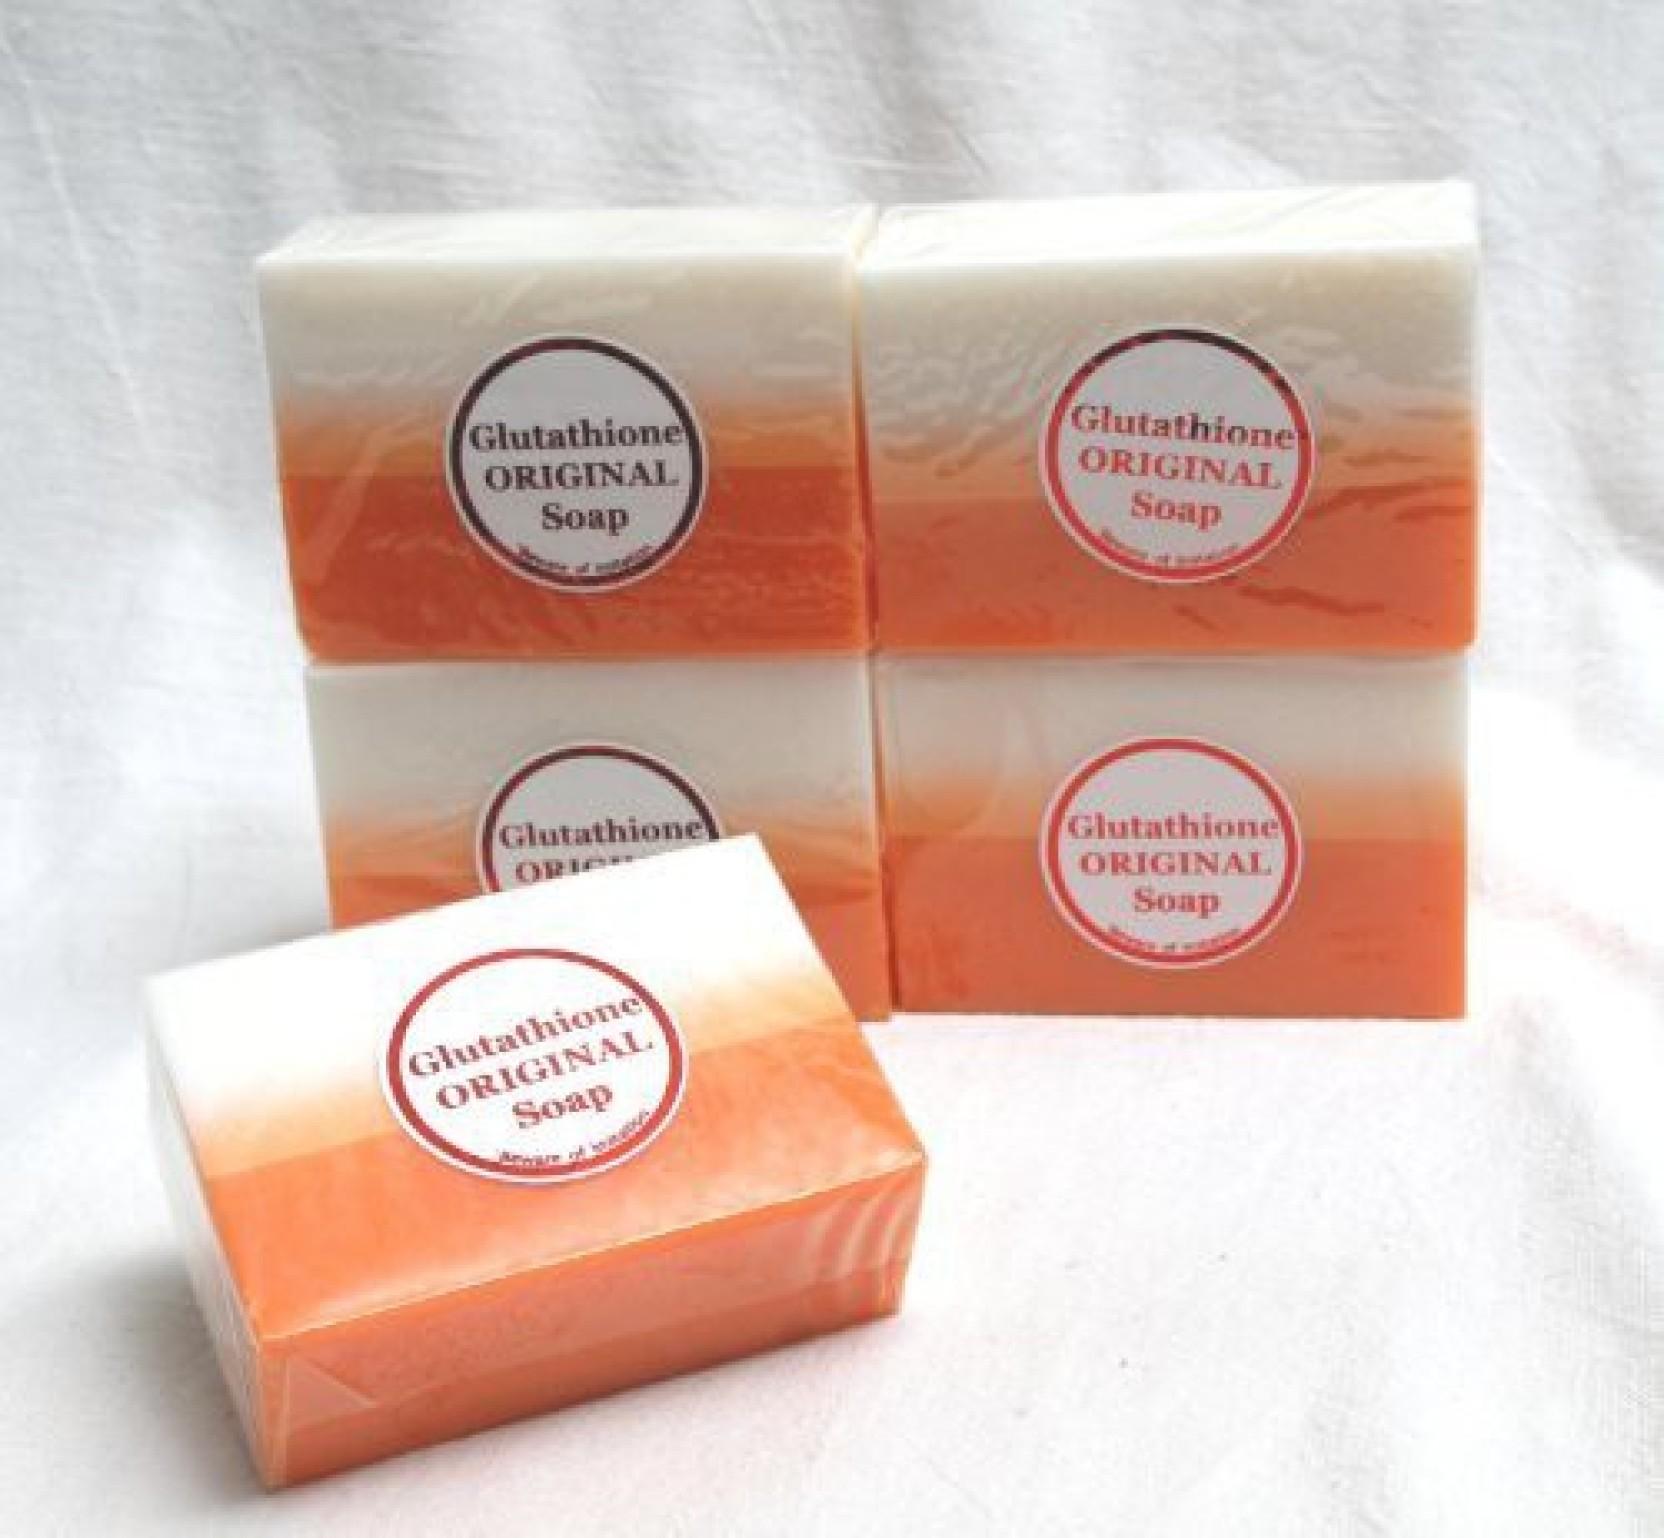 Dermaline Kojic Acid Glutathione Dual Whitening Bleaching Soap Buy Ready 2 White Whitener Body Lotion 150ml Add To Cart